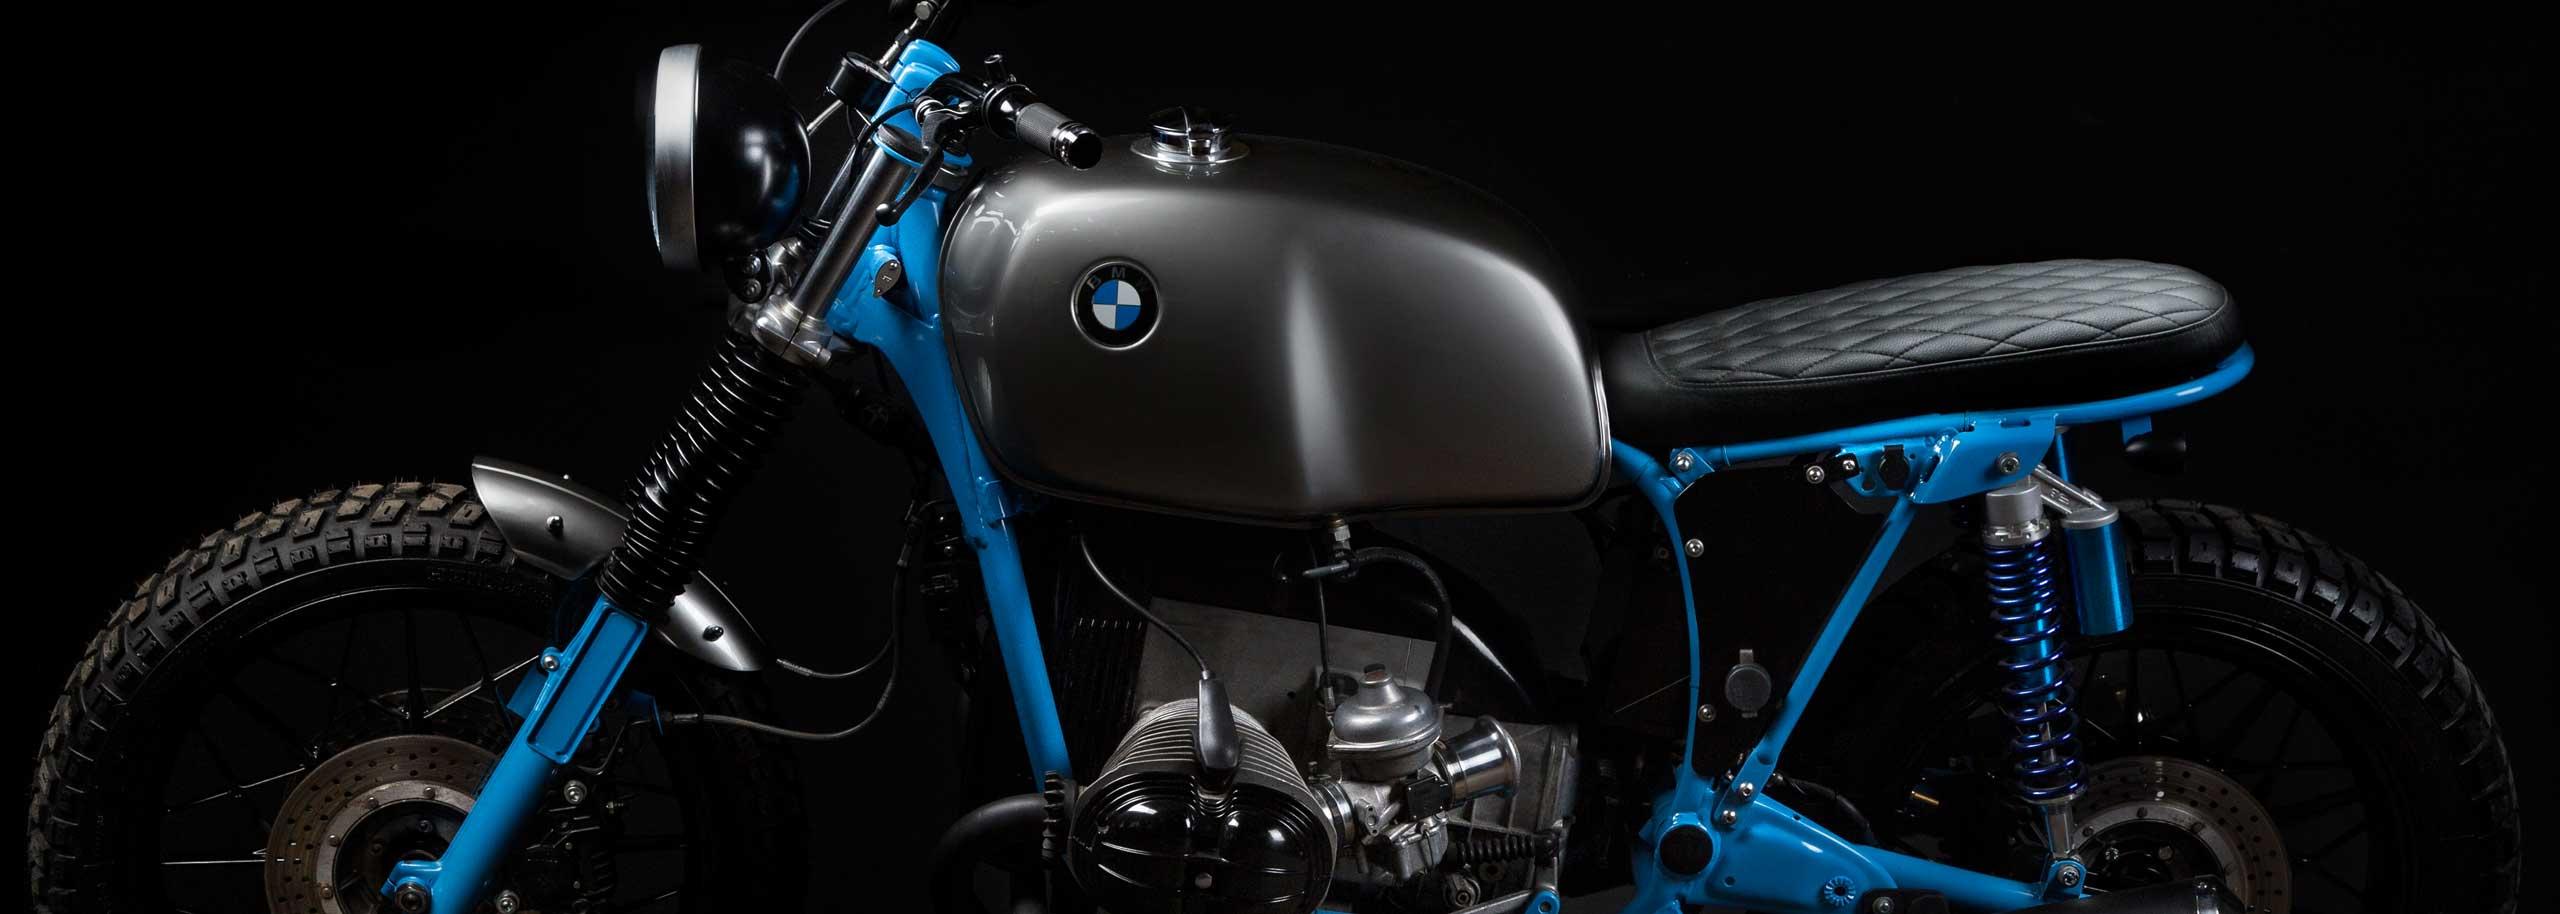 02_TITAN-PRATTER_BMW-R100-RS_Cafe-Racer-Graz-Motorrad-Umbau-Austria-Vintage_Custom_Kellermann_Motogadget_Rizoma_Brembo_LSL_Sebring